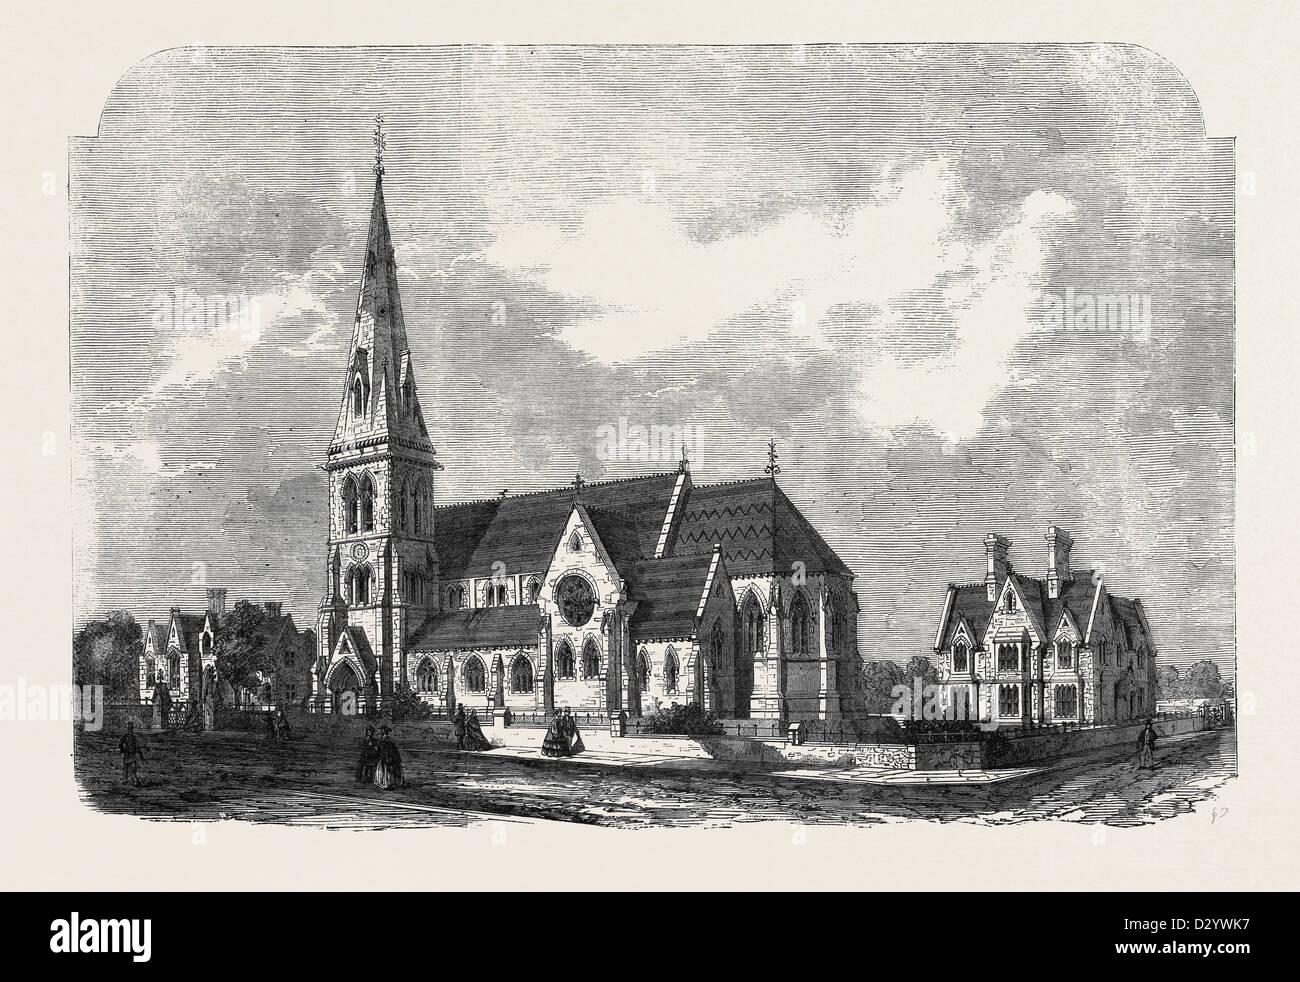 ST. ANNEN KIRCHE PFARRHAUS UND SCHULEN HANGER LANE STAMFORD HILL Stockbild